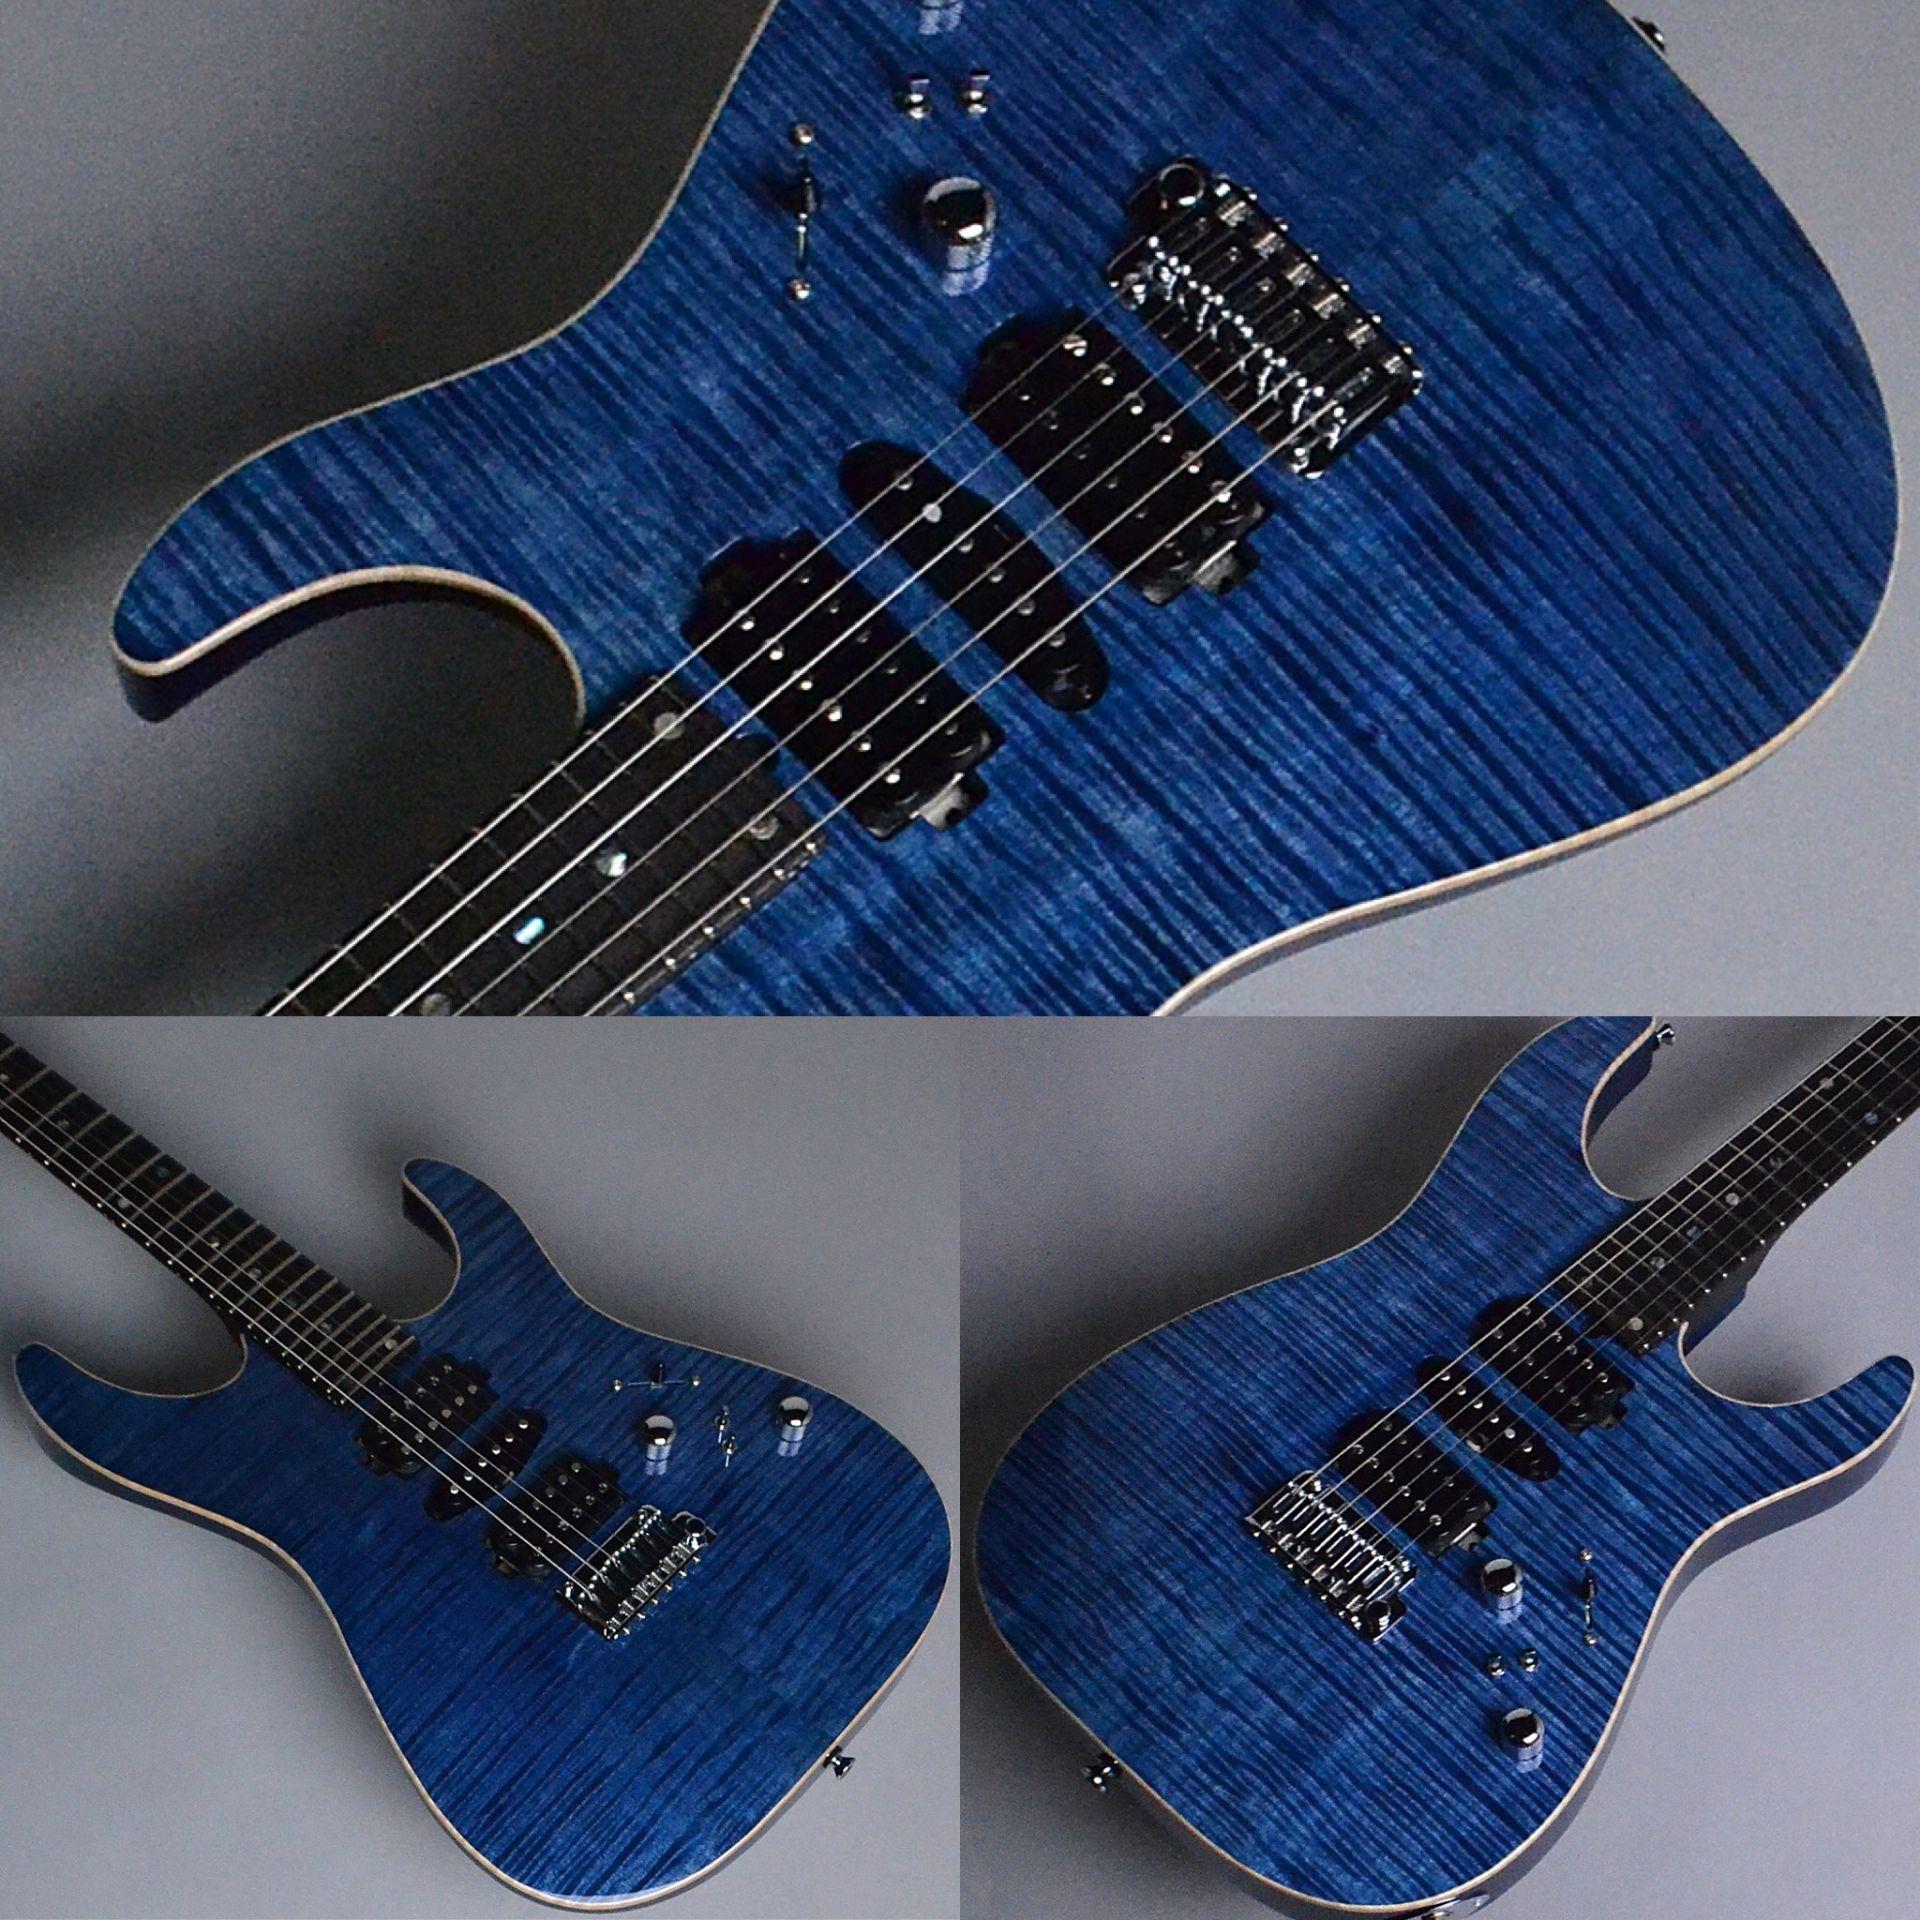 DST-Pro24 Custom Arctic Blue (AB) 【S/N:031789】のケース・その他画像